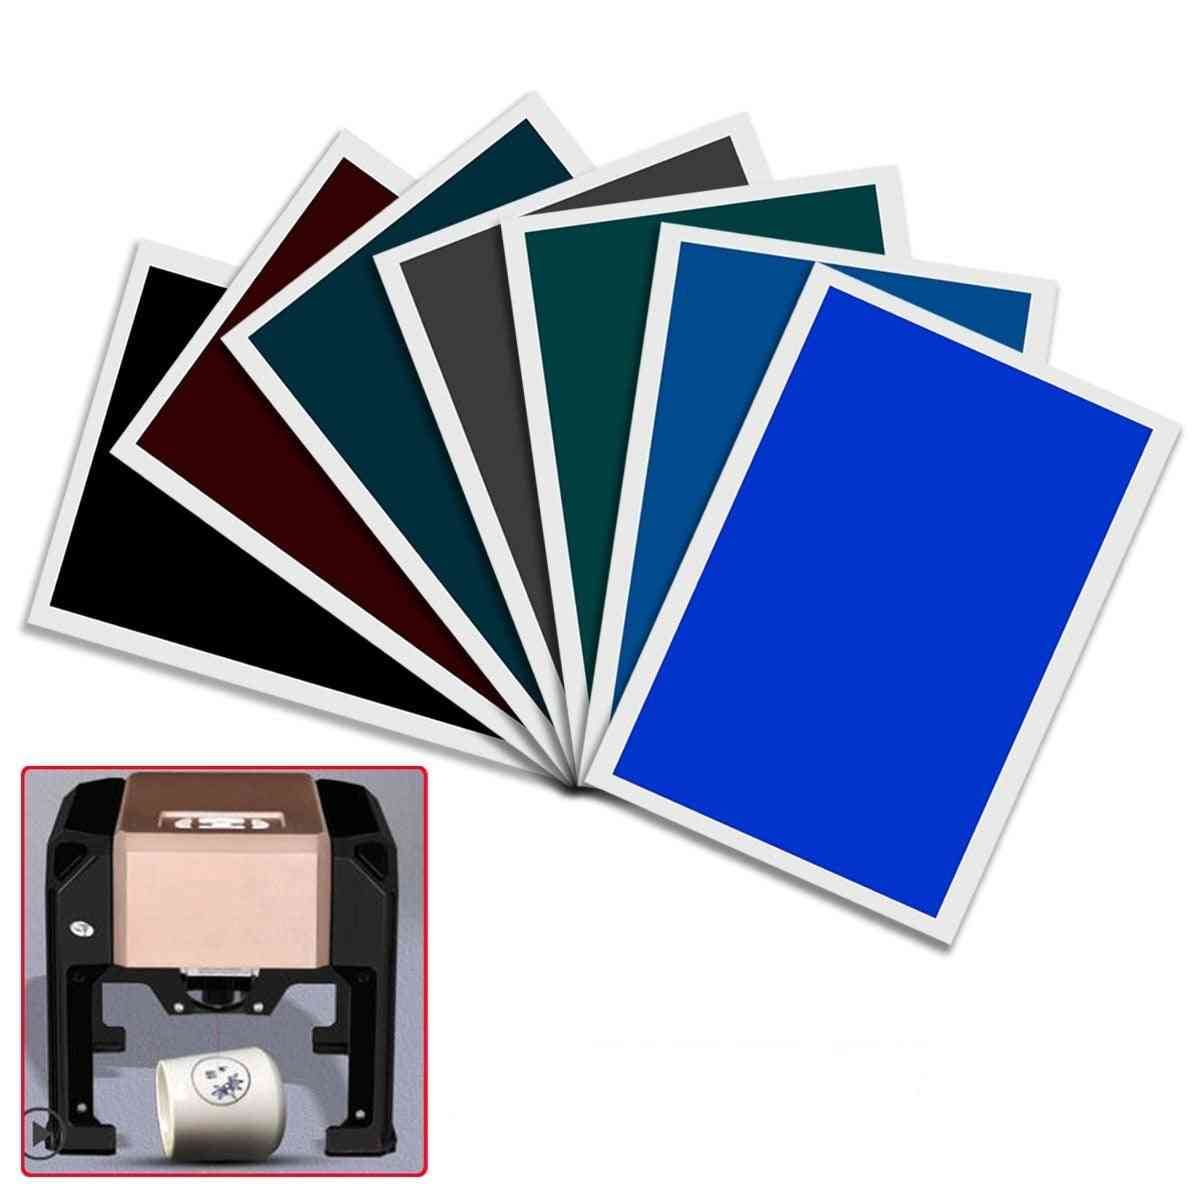 Ceramic Laser Paper For Cnc Laser Engraving Machine